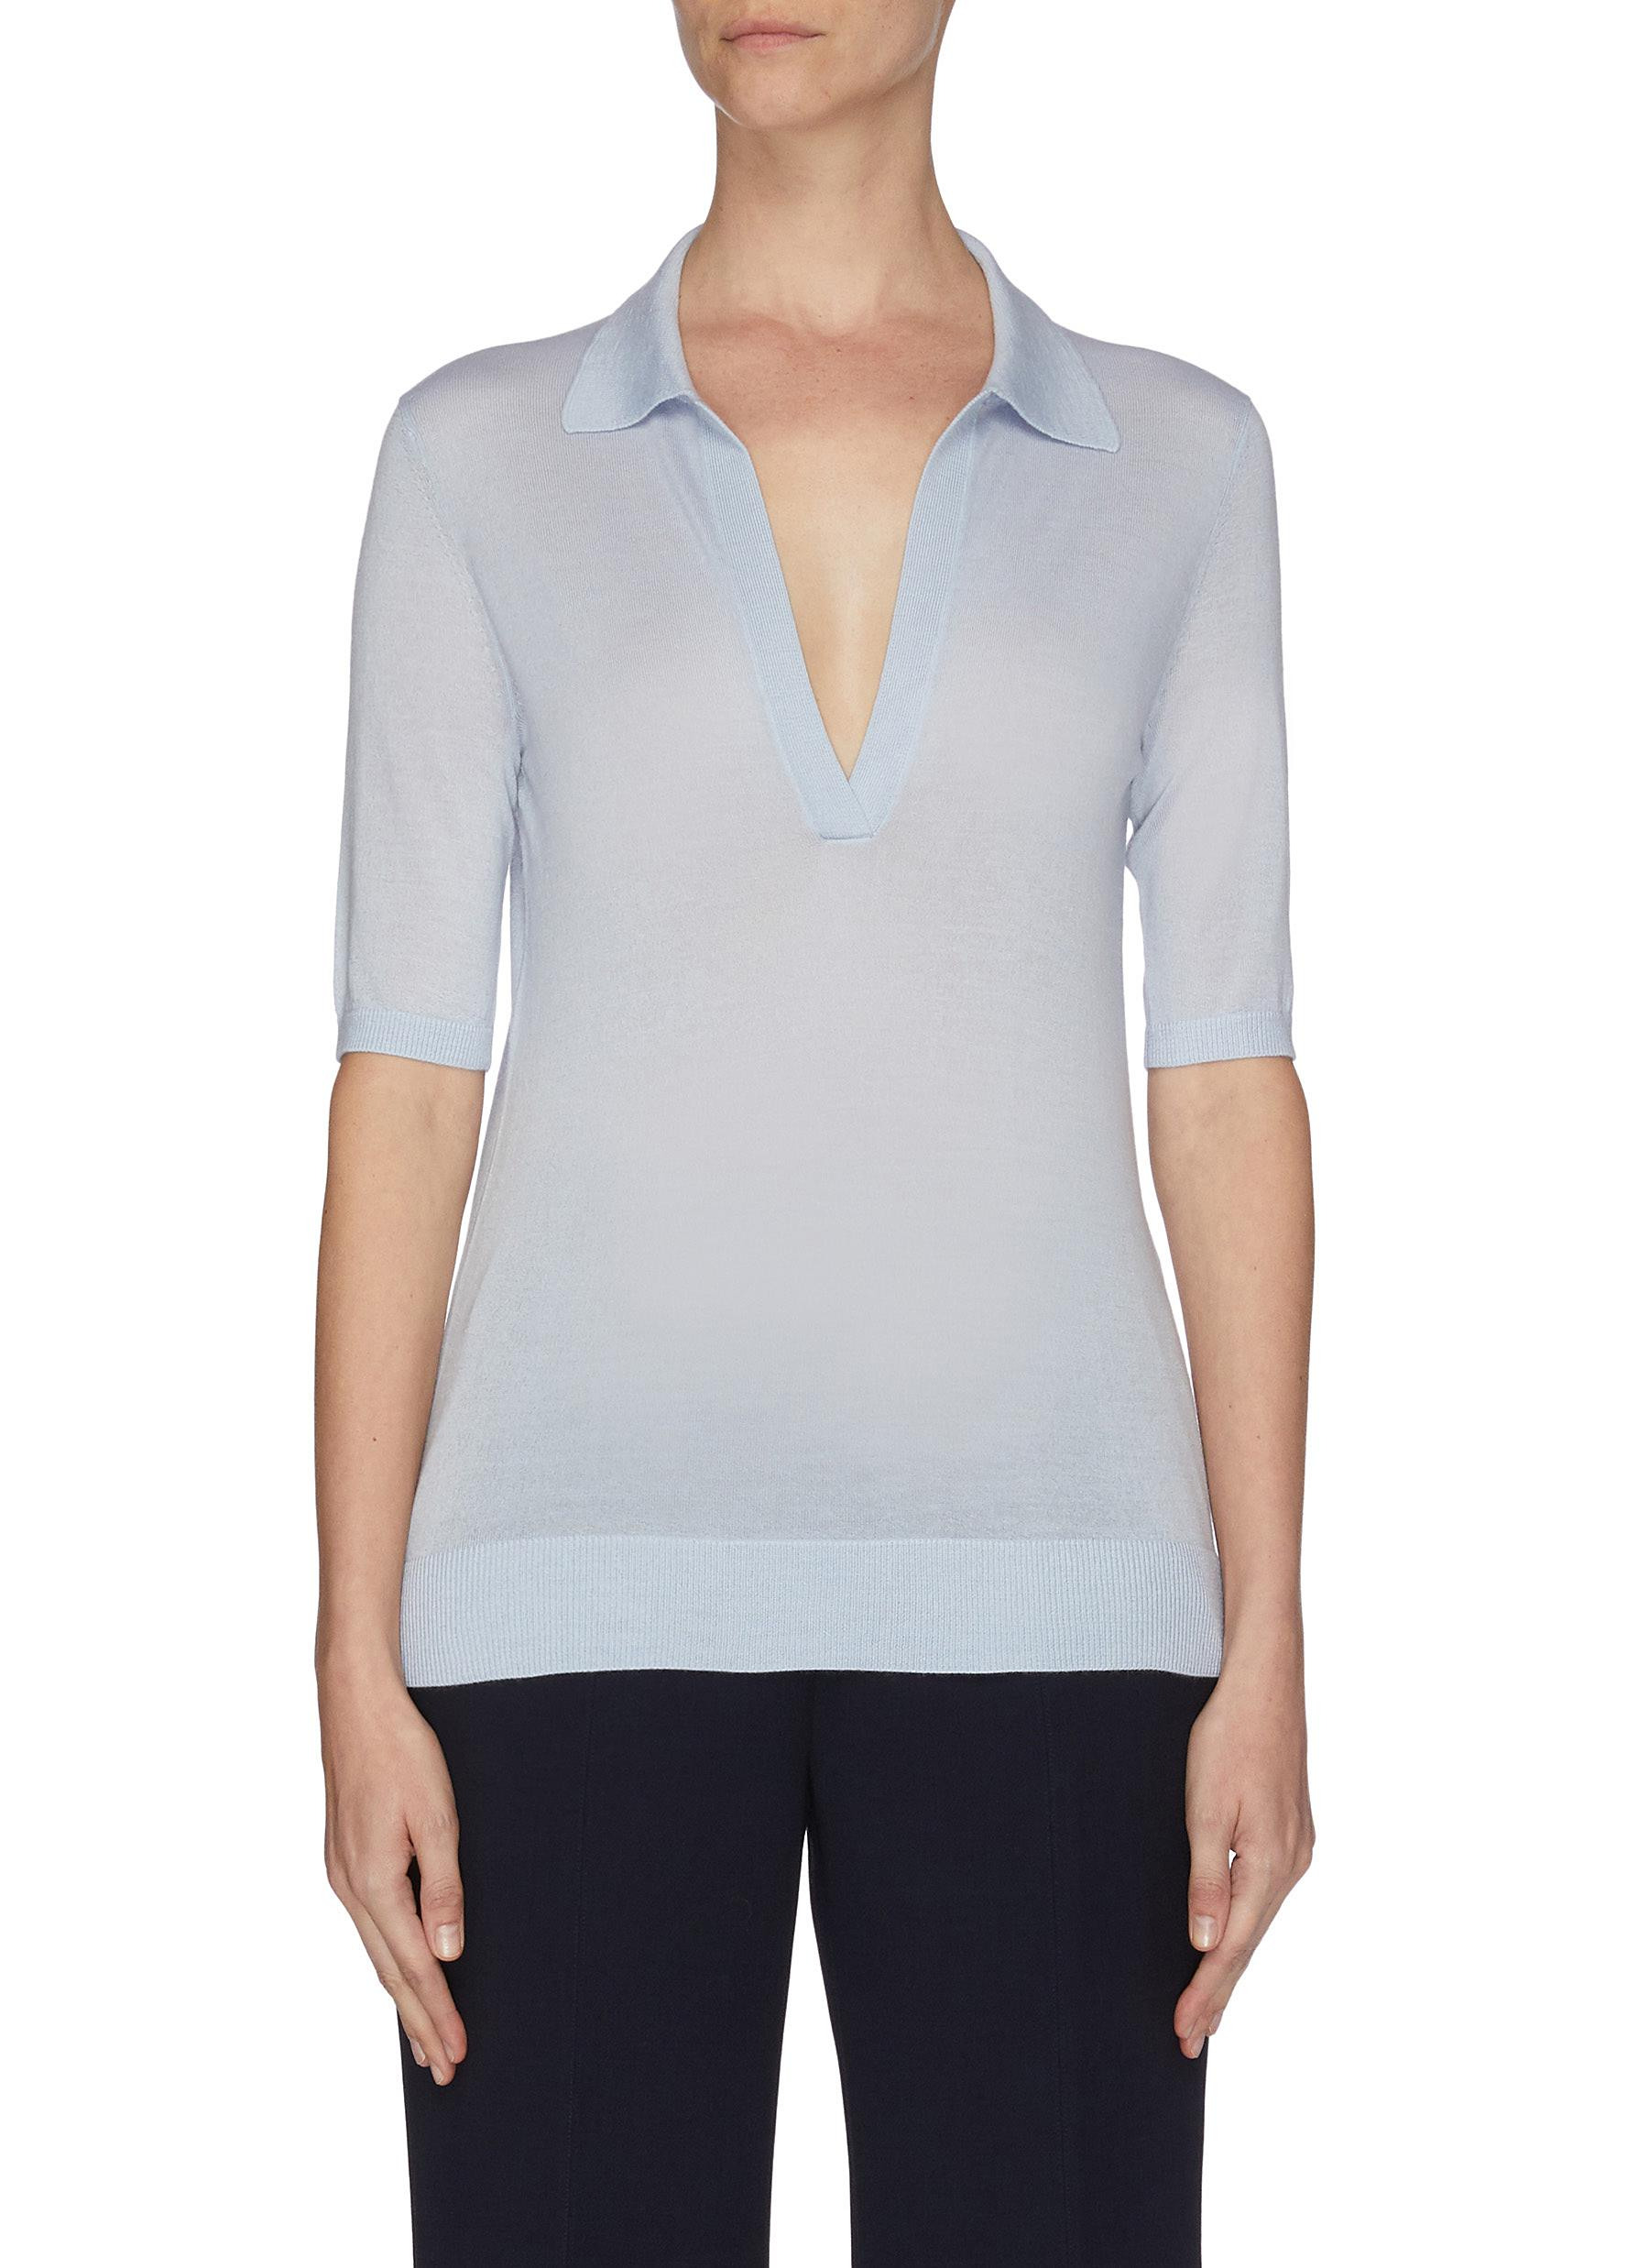 Buy Gabriela Hearst Knitwear V-neck cashmere-silk blend knit top